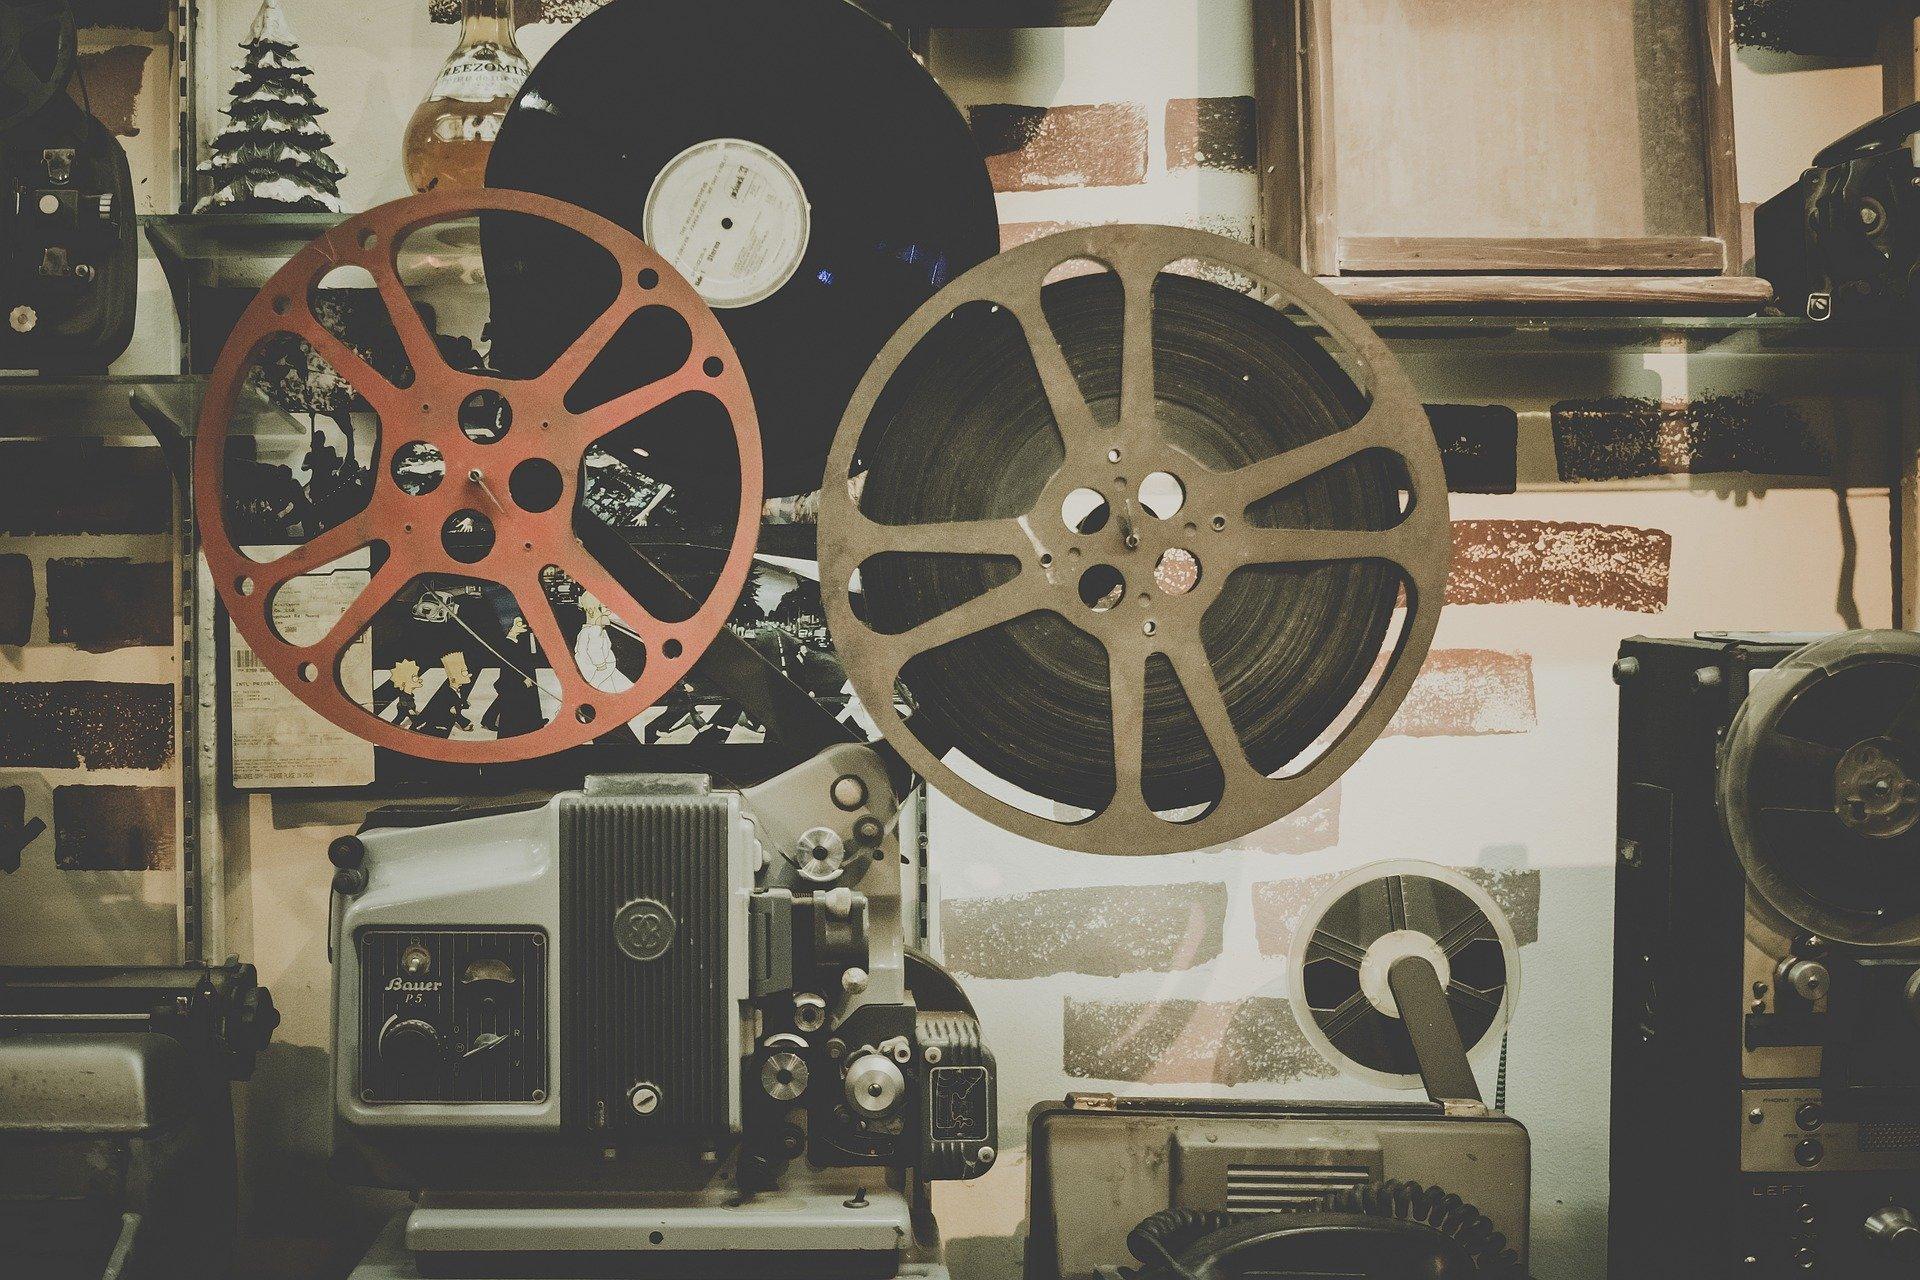 20372-movie-918655-1920.jpg